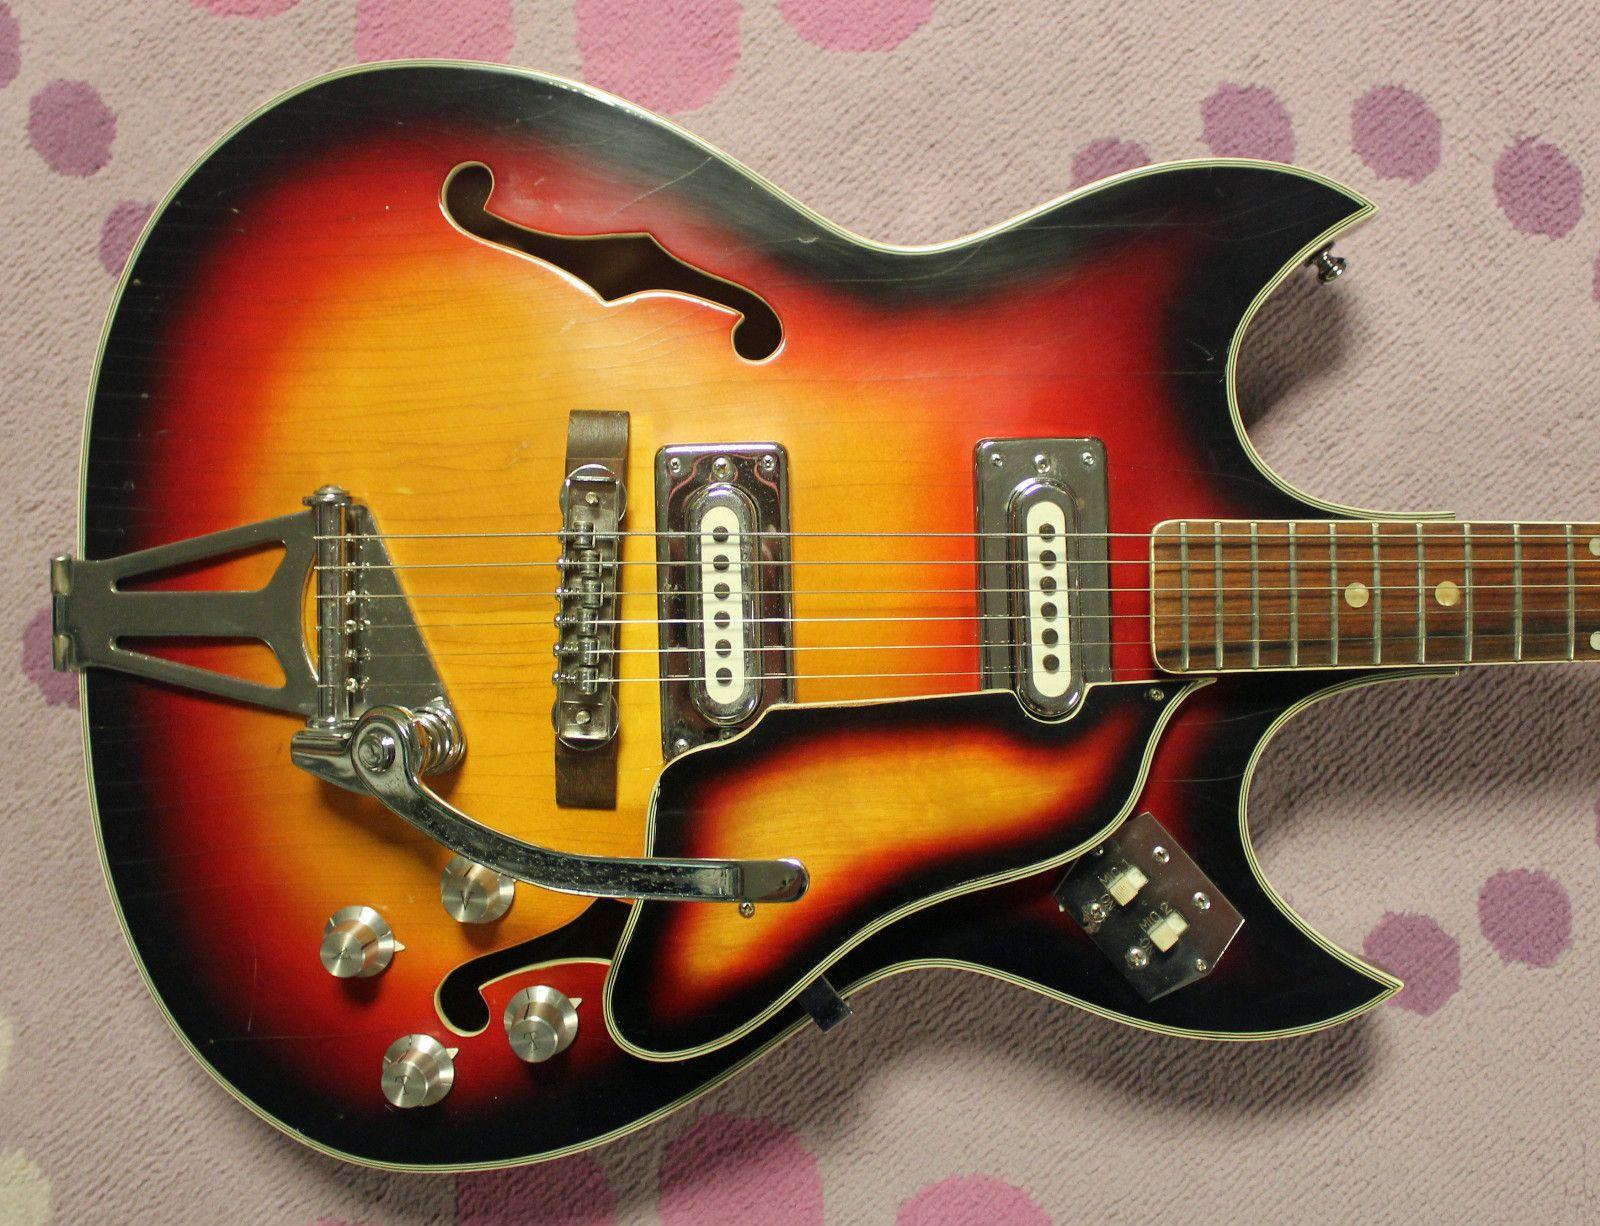 17d67813fe2a156bf3641d59d663c46d 1960s barney kessel fiama vintage japan teisco & vintage mij  at crackthecode.co